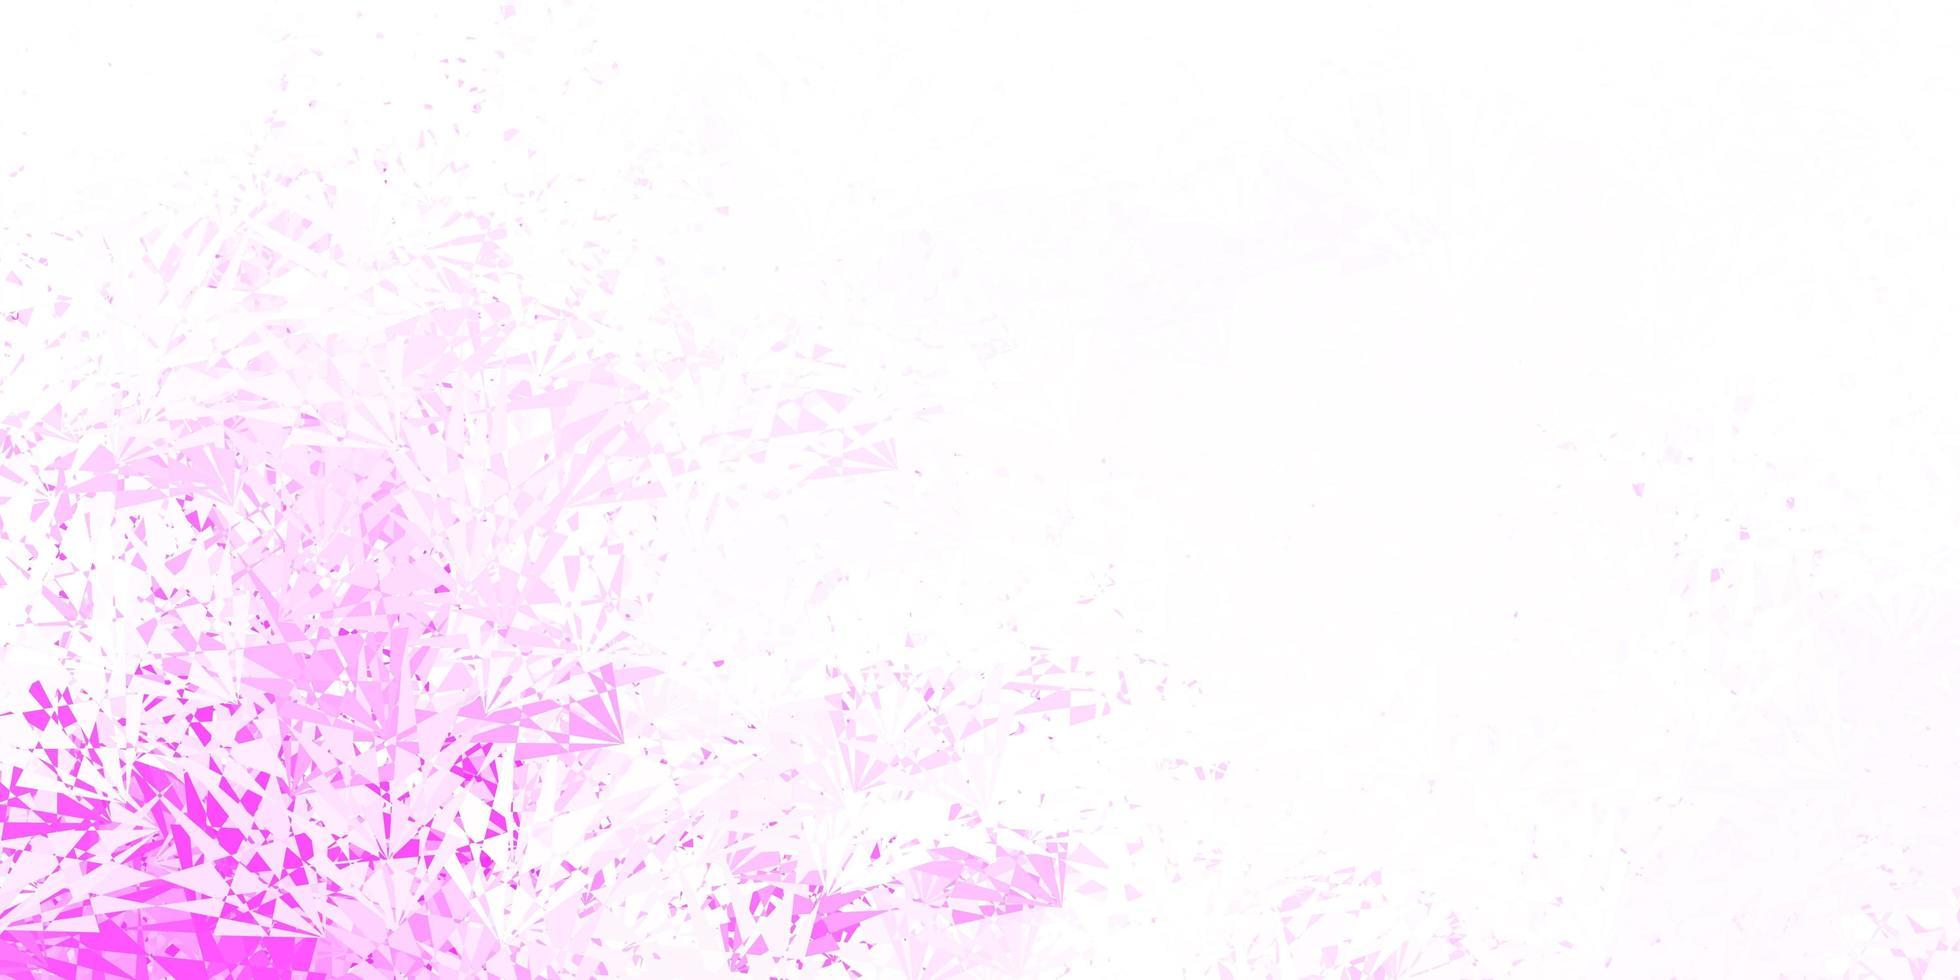 fundo vector rosa claro com formas poligonais.